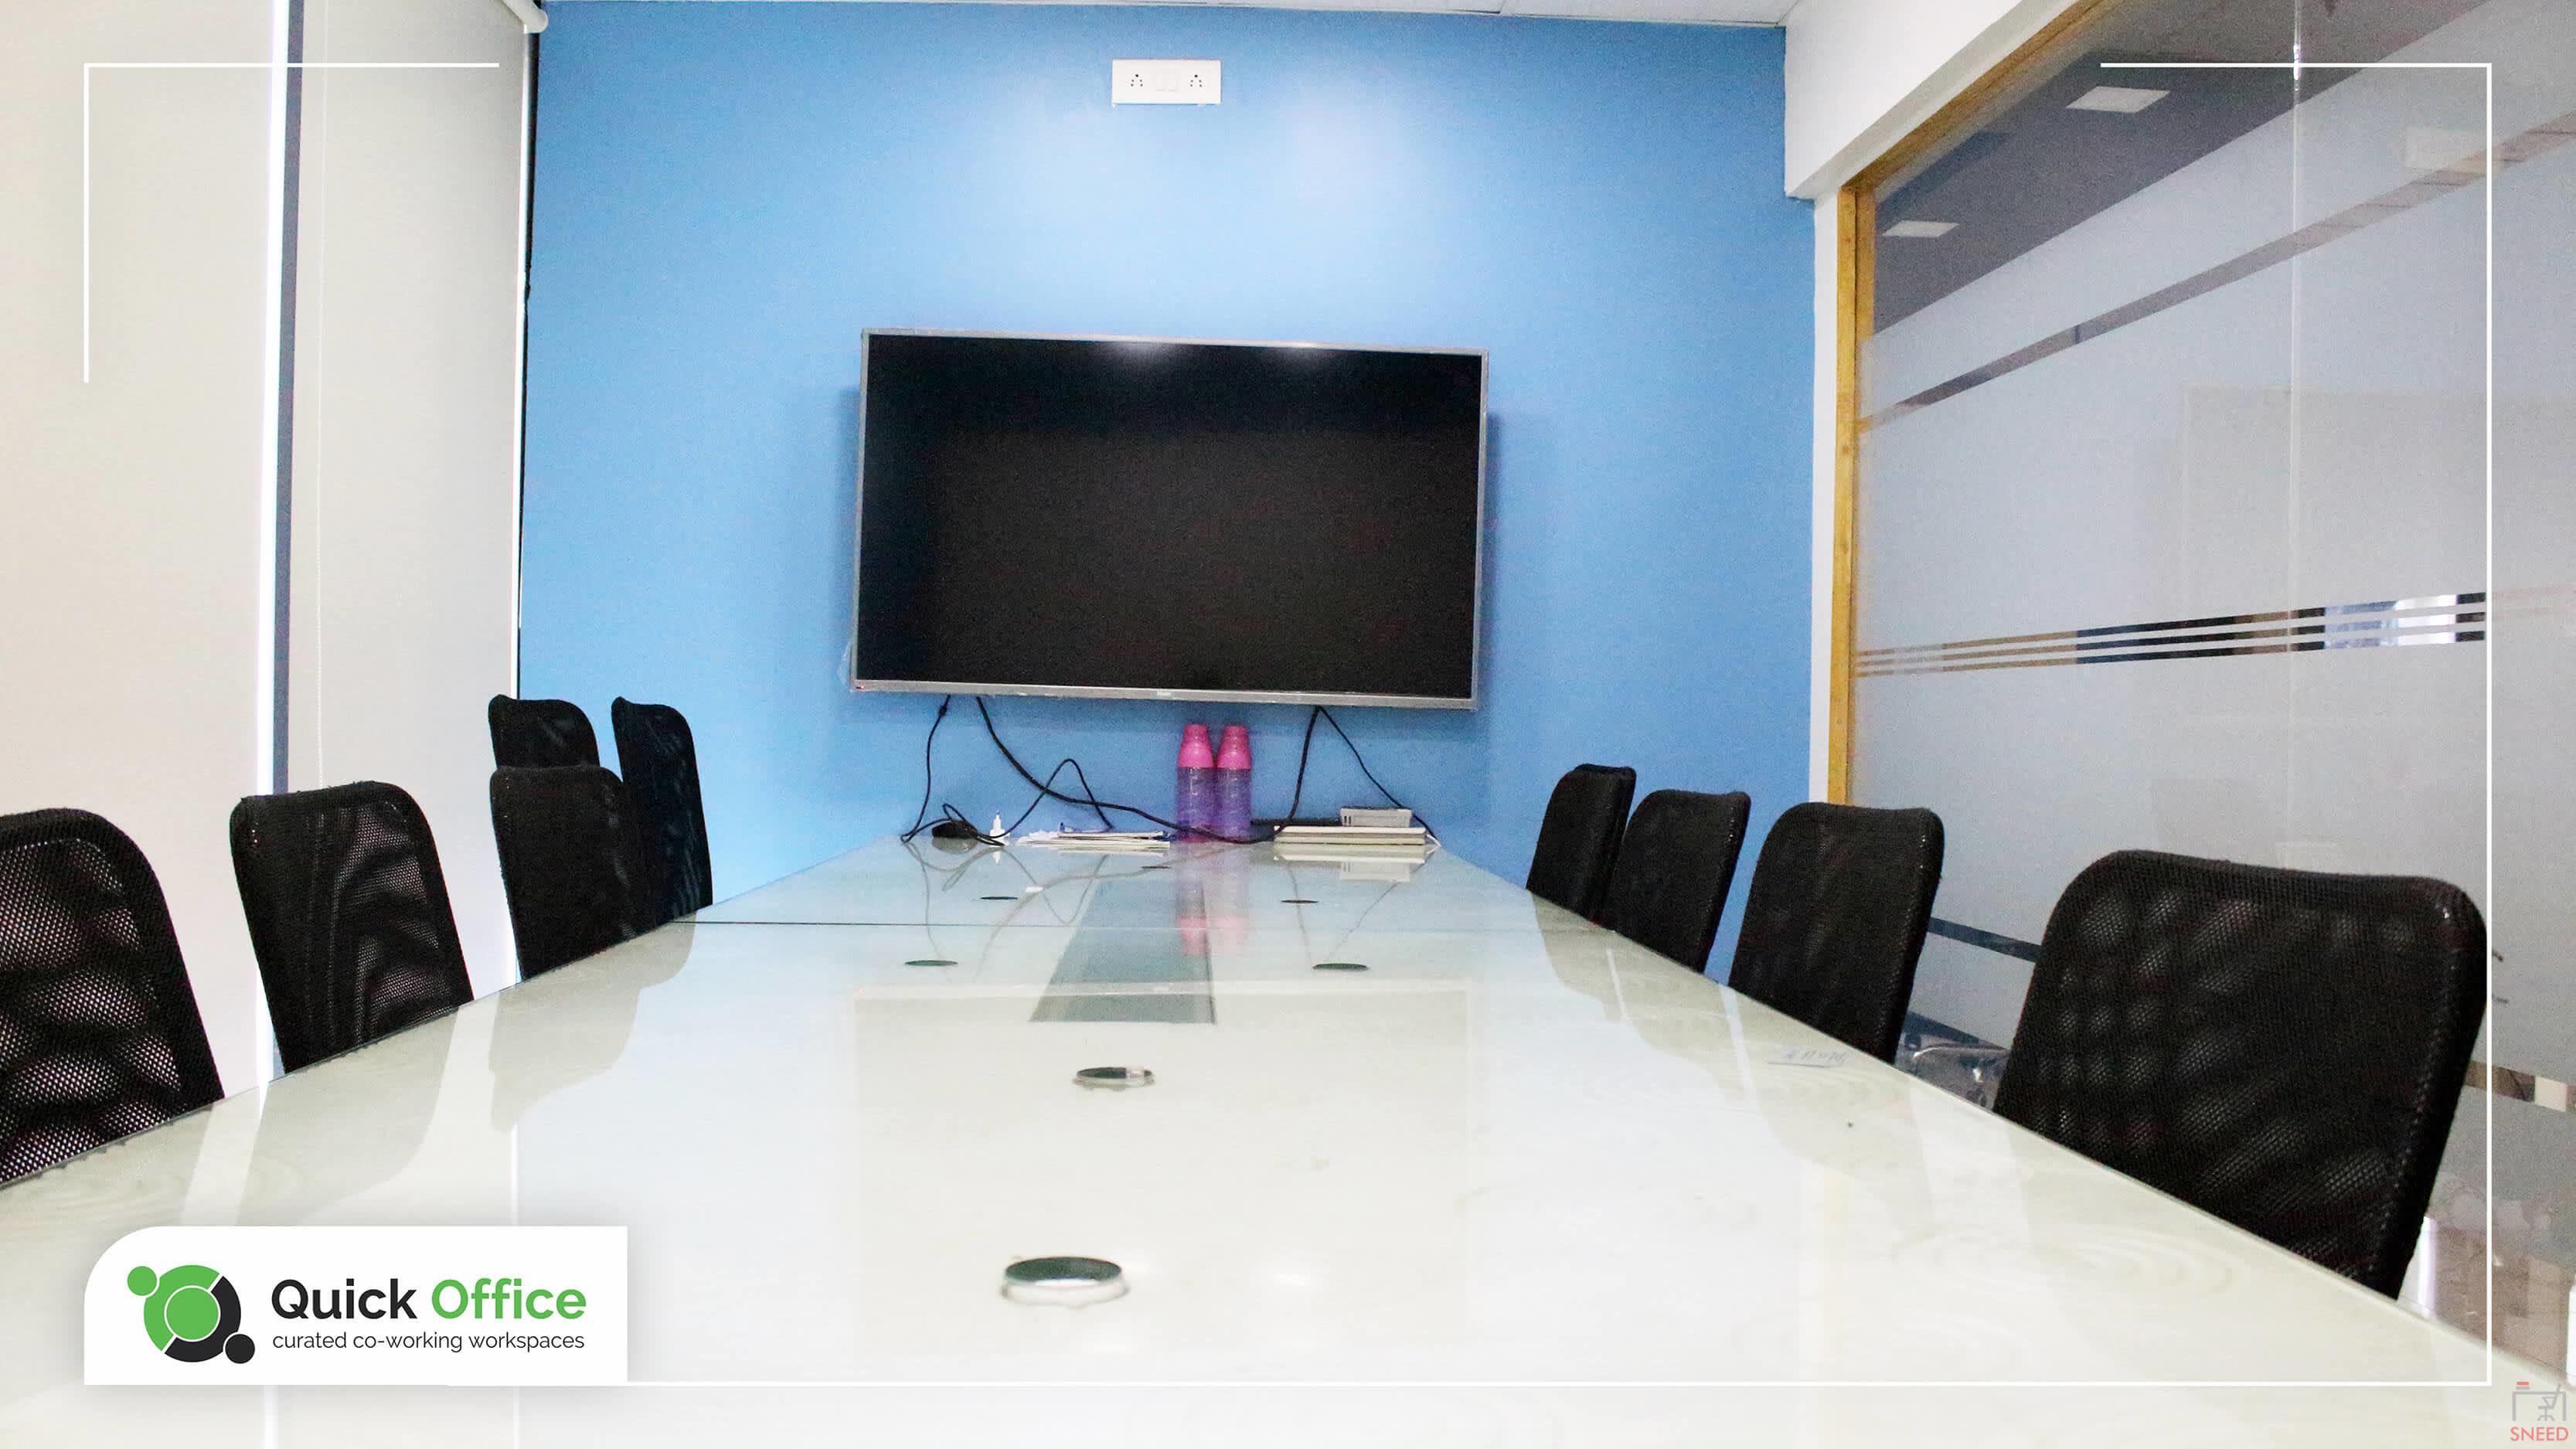 10 seaters Meeting Room image